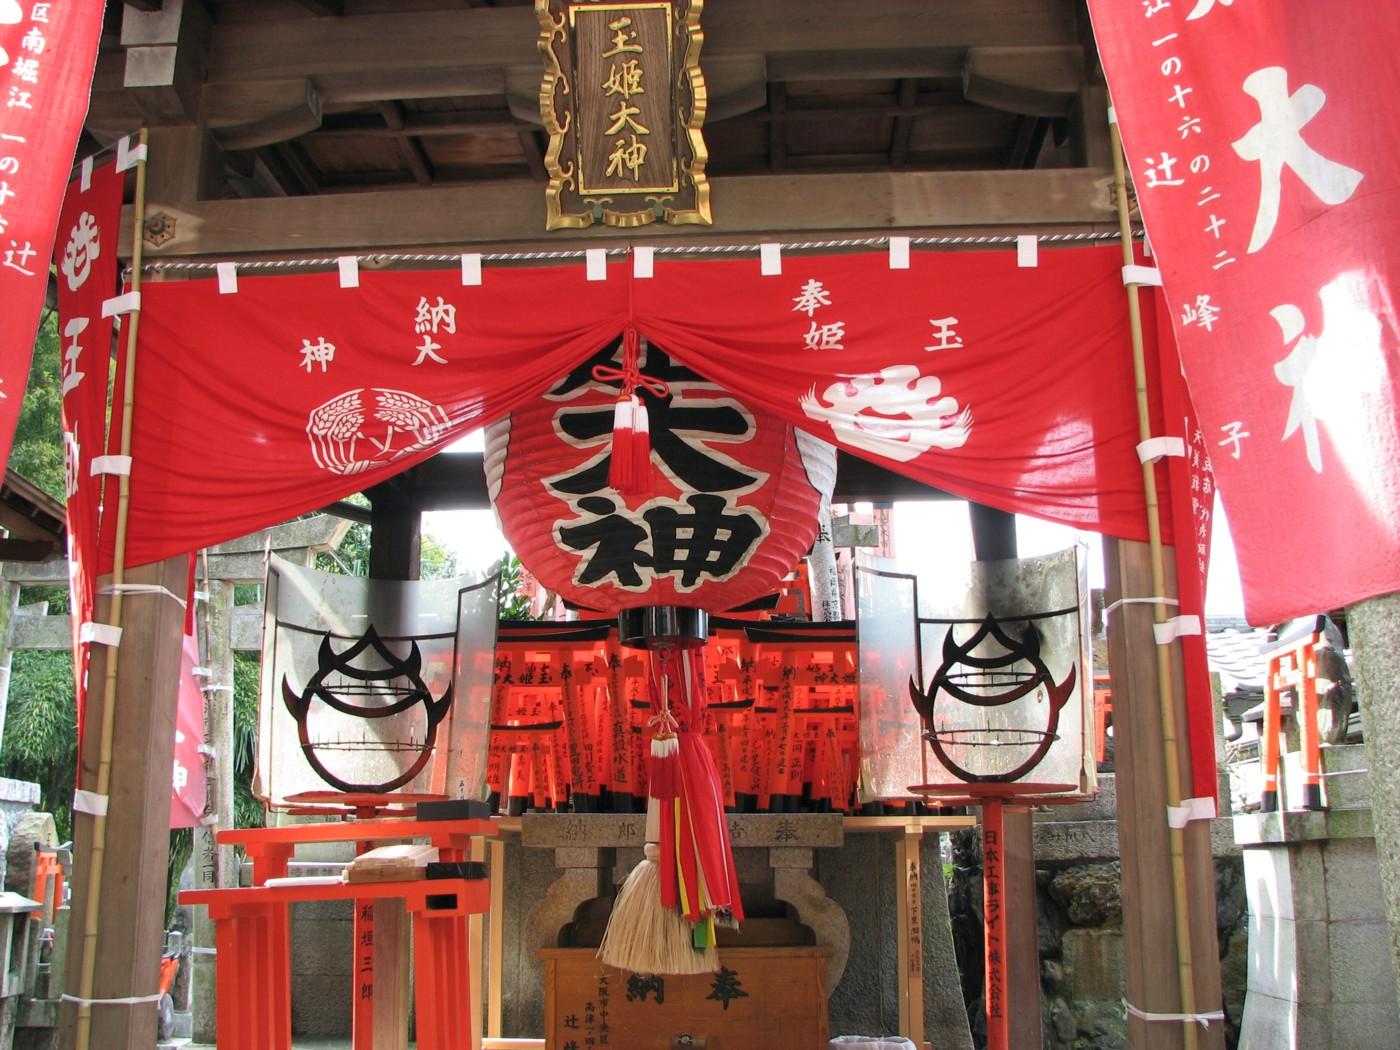 Japanese Lantern Fushimi Inari Taisha 伏見稲荷大社